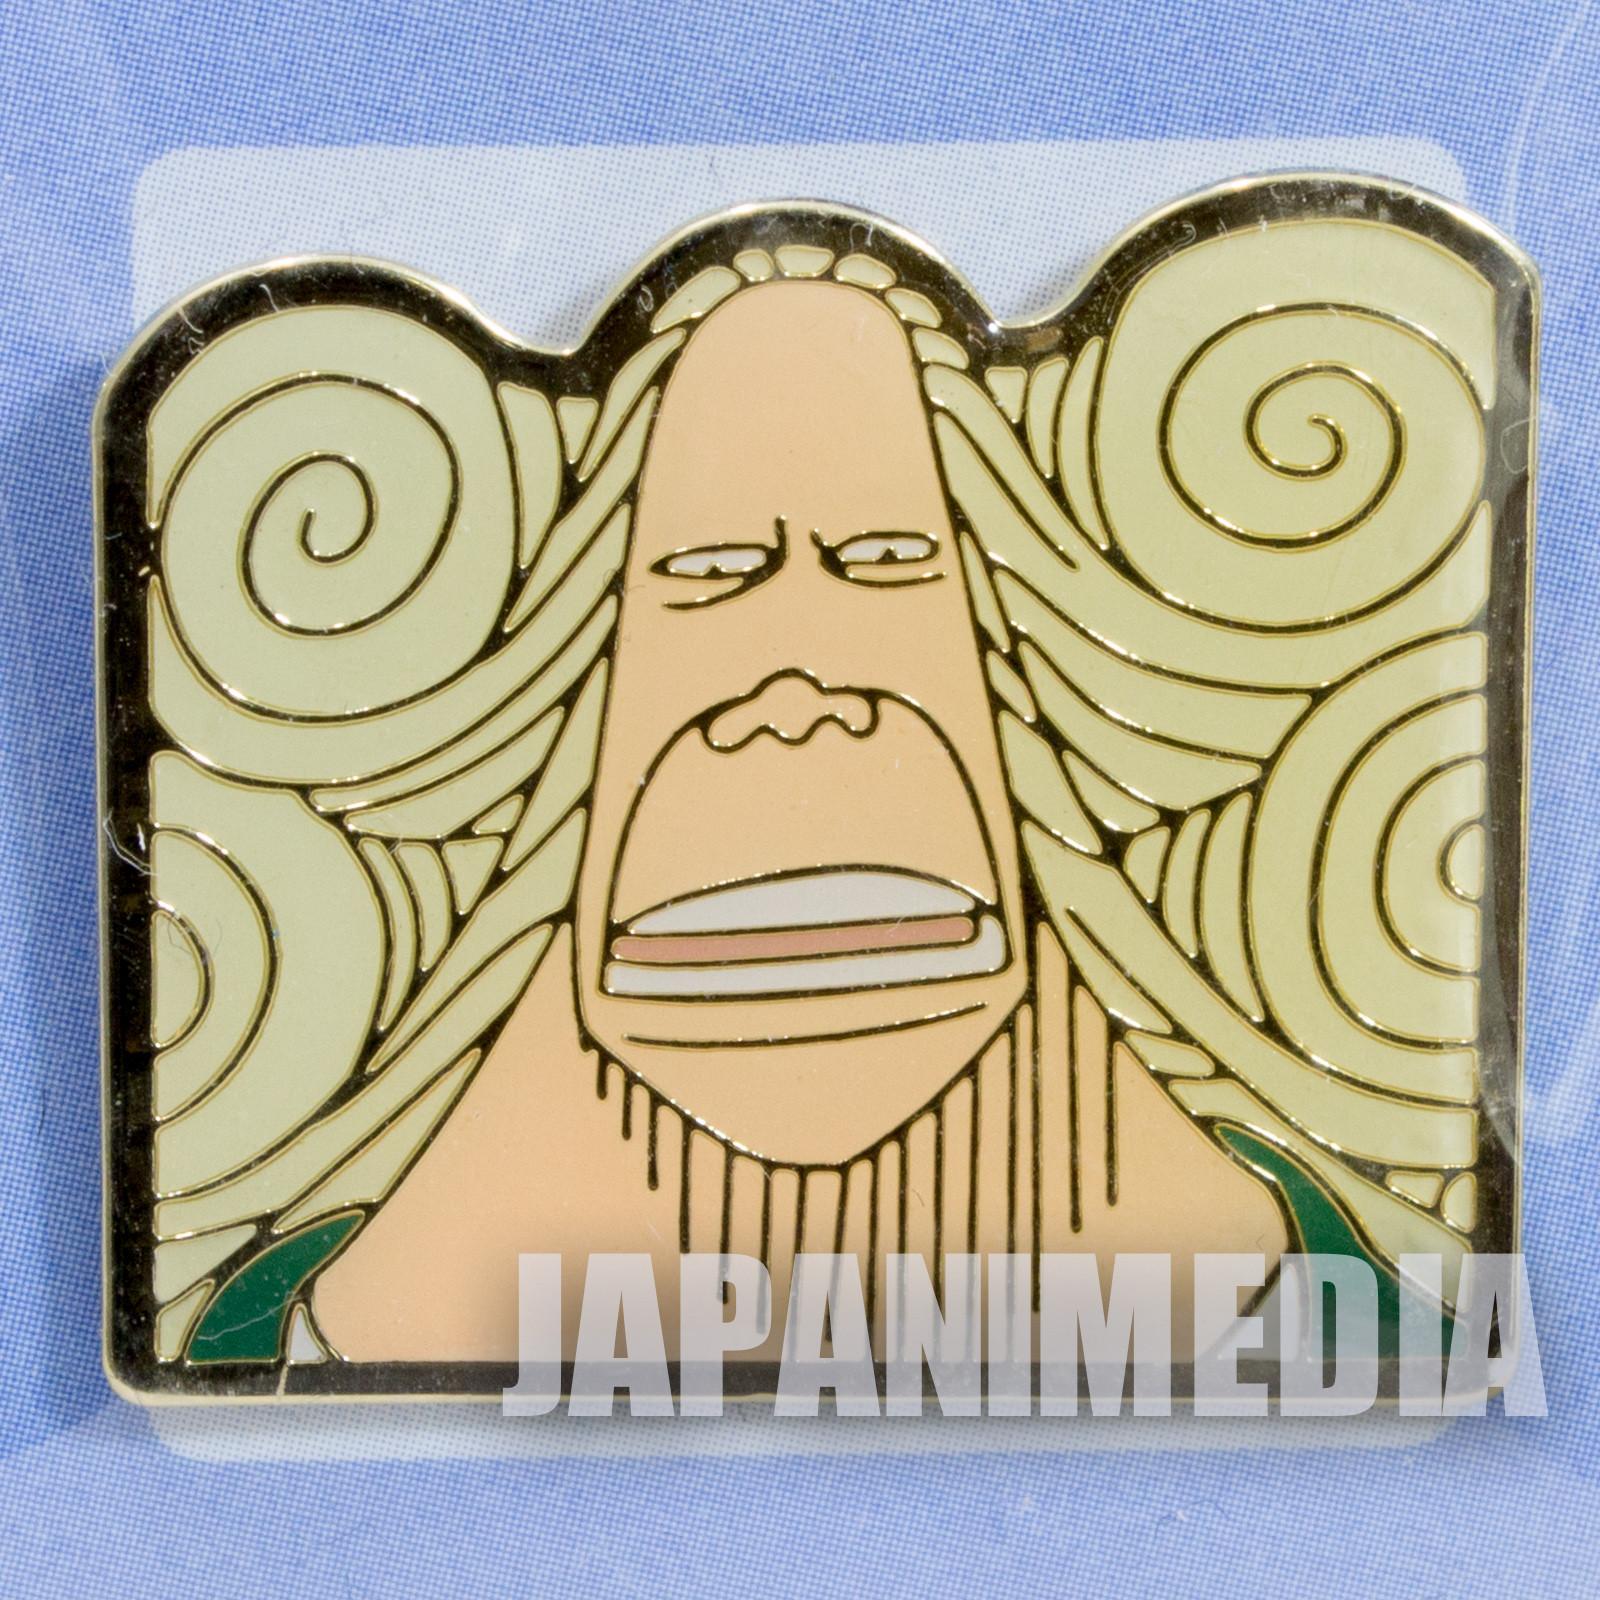 ONE PIECE Igaramu Weekly Jump Character Pins JAPAN ANIME MANGA